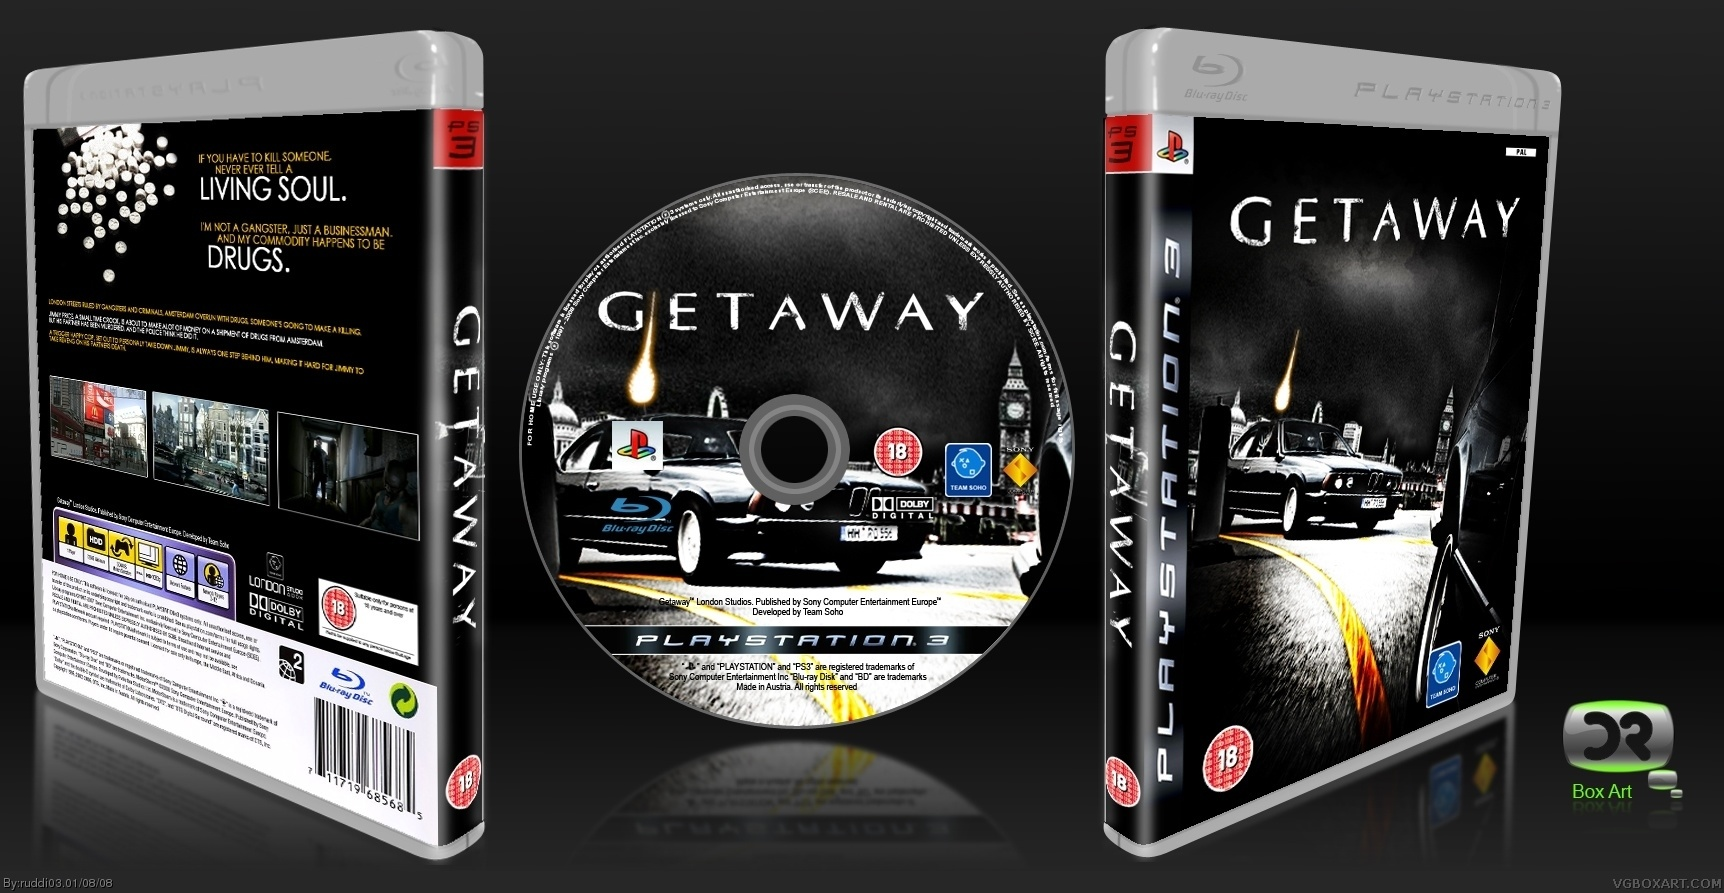 Getaway Playstation 3 Box Art Cover By Ruddi03